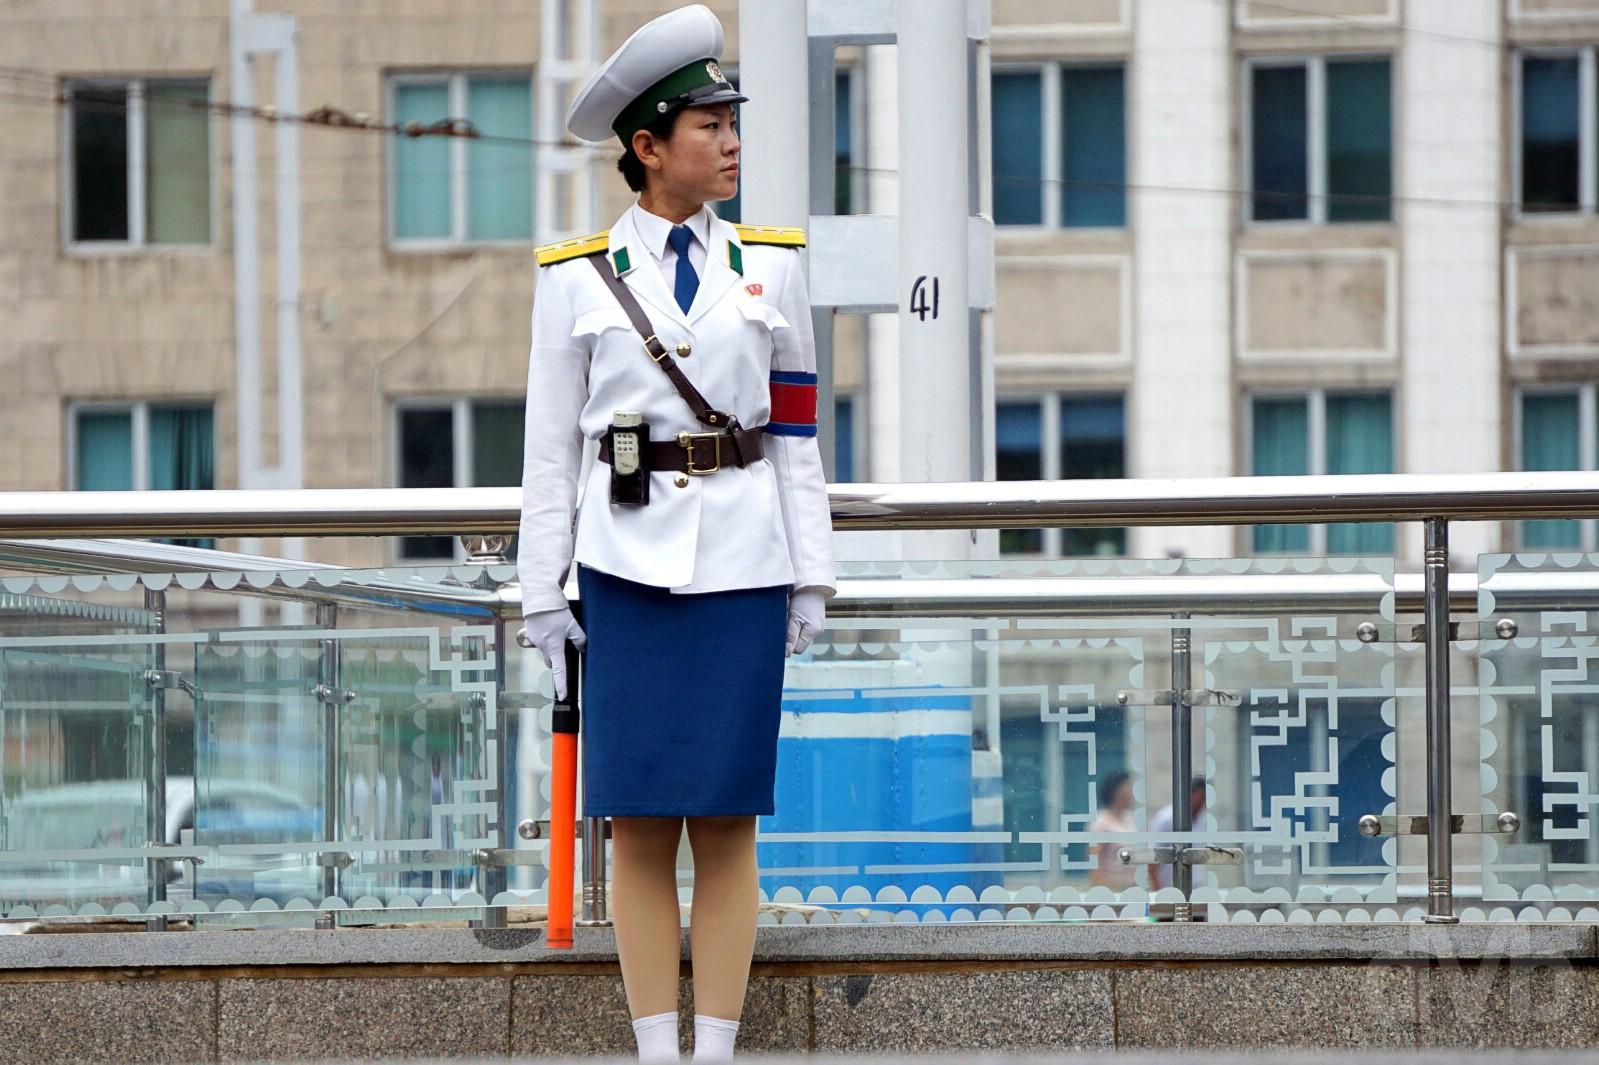 Sungri Street, Pyongyang, North Korea. August 15, 2017.